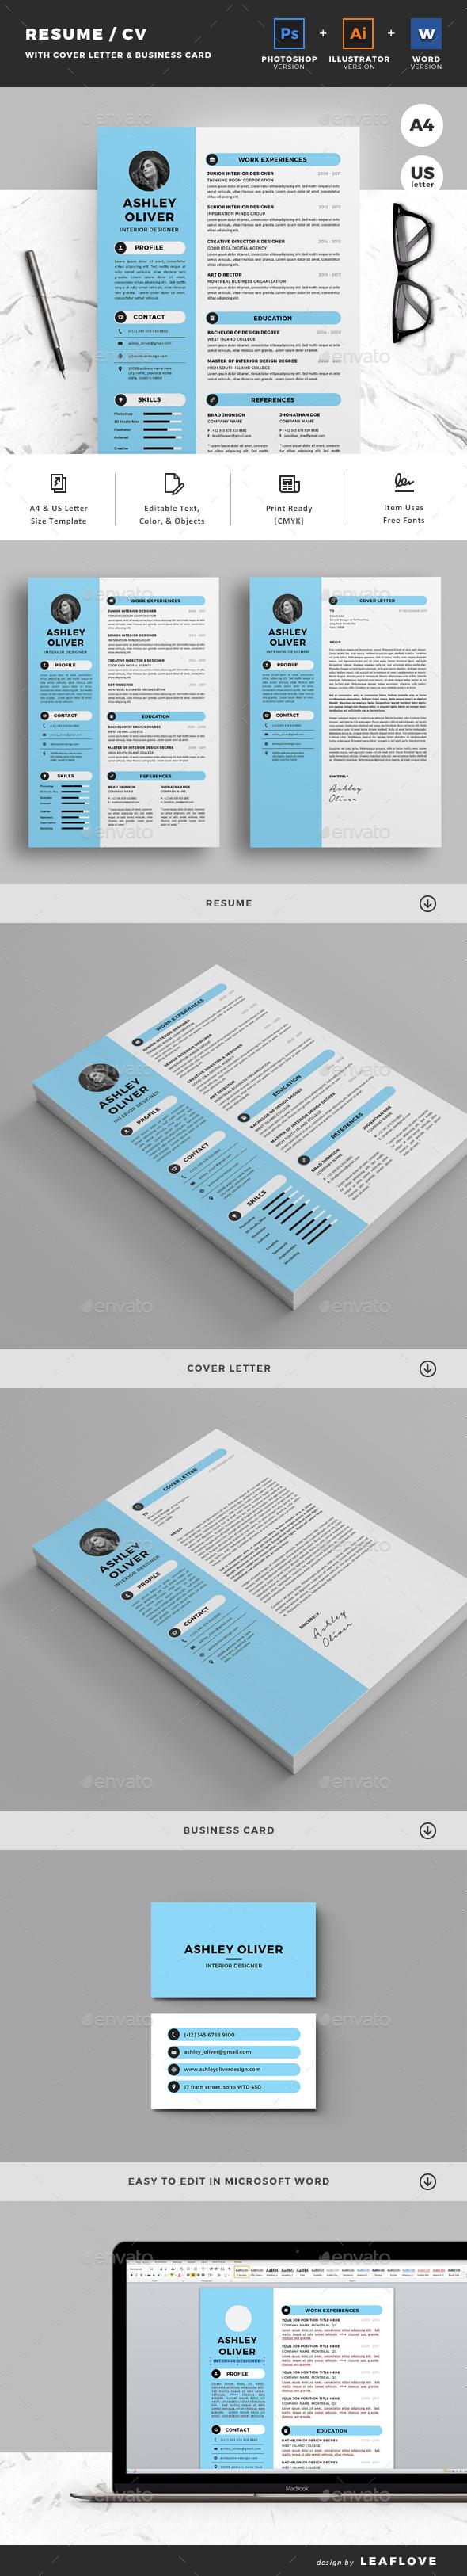 microsoft word resume generator